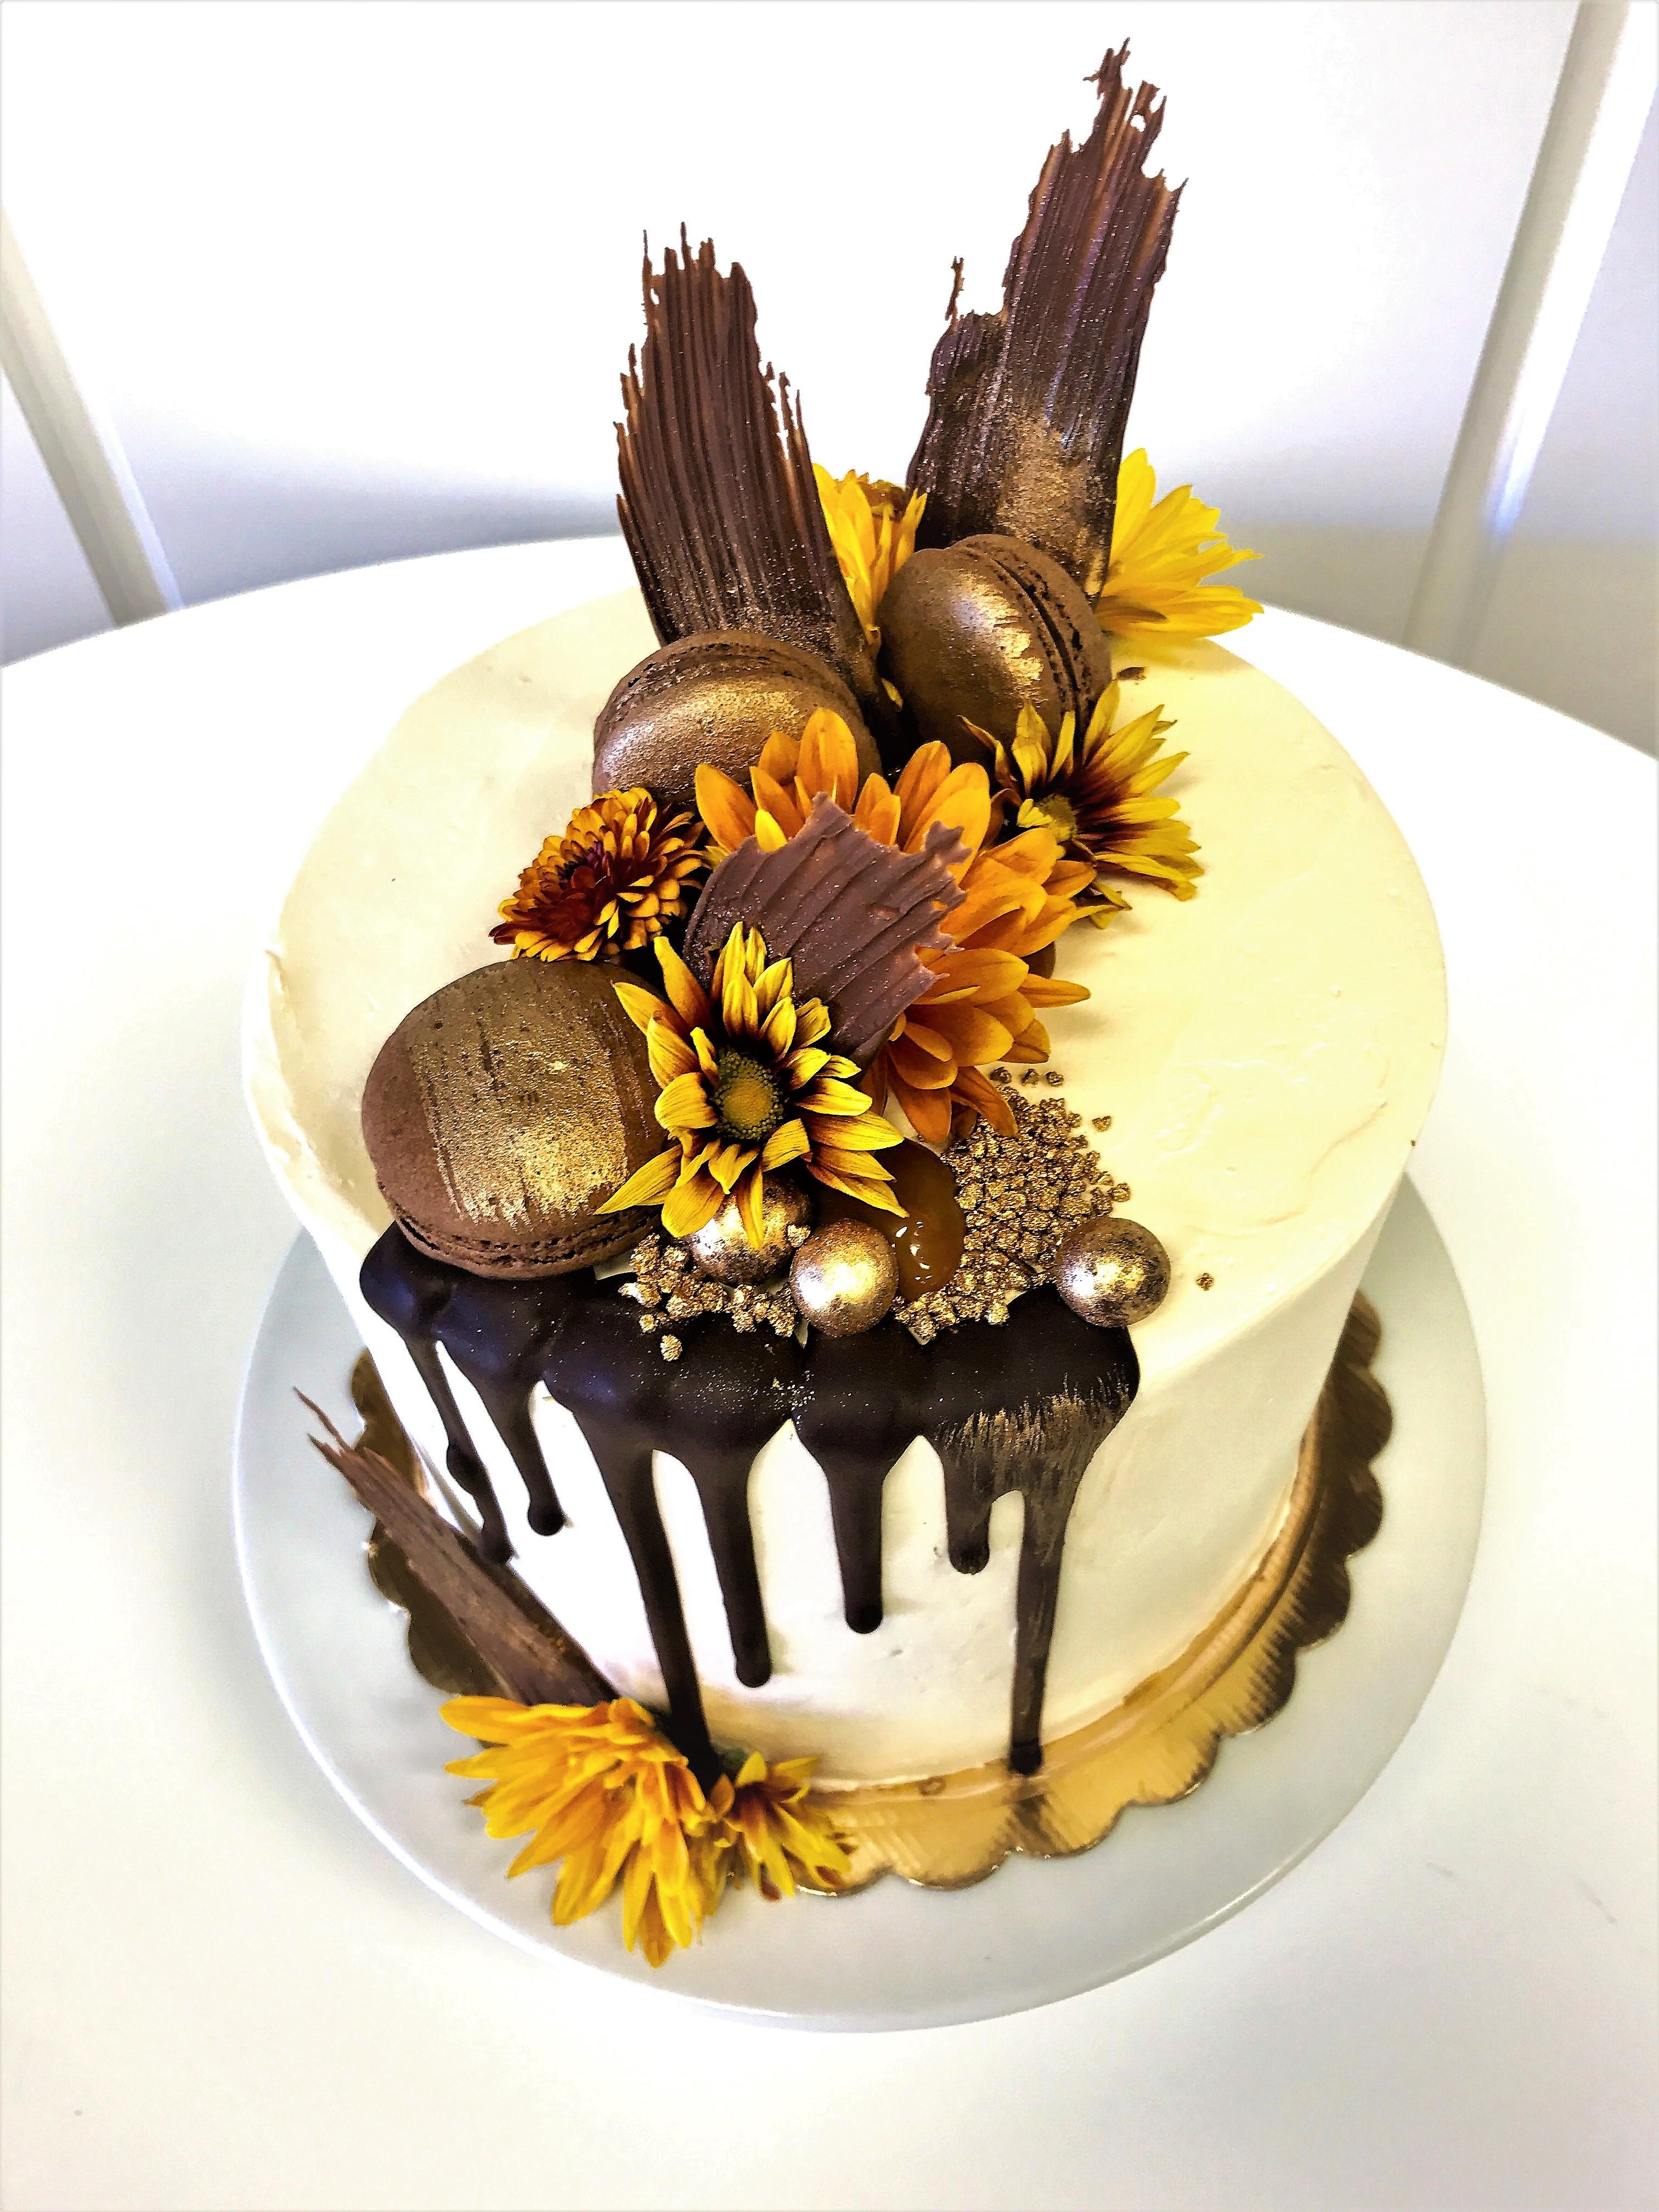 8'' chocolate salted caramel cake